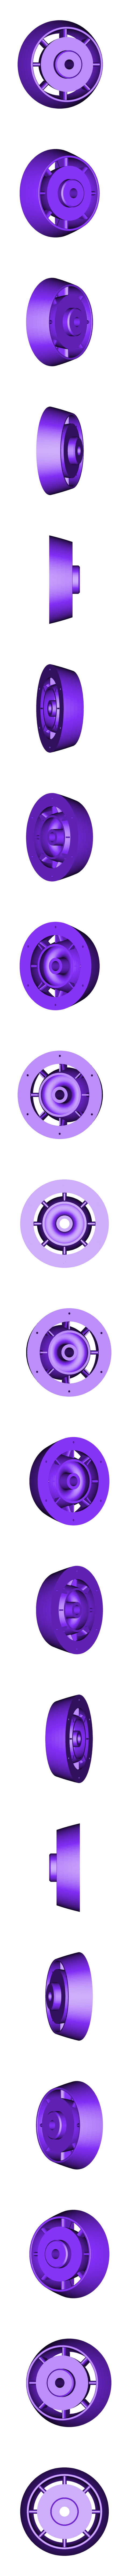 LPC-Inlet01ws.stl Download STL file Thrust Reverser with Turbofan Engine Nacelle • 3D printable model, konchan77